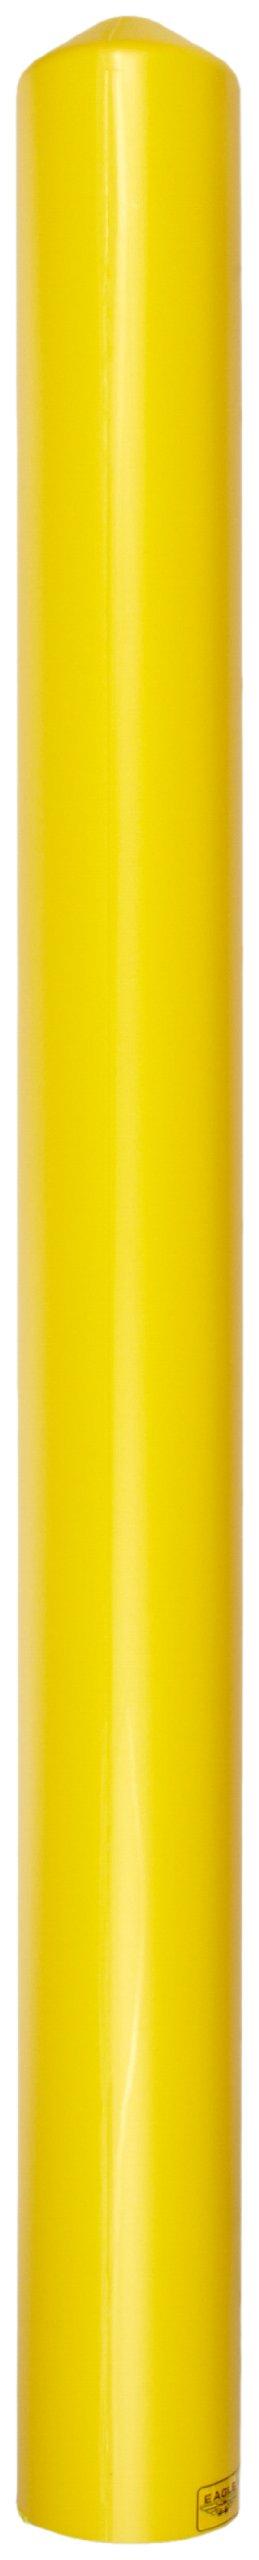 Eagle 1735 HDPE 4'' Smooth/Bollard Post Sleeve, Yellow, 5.25'' OD, 56'' Height